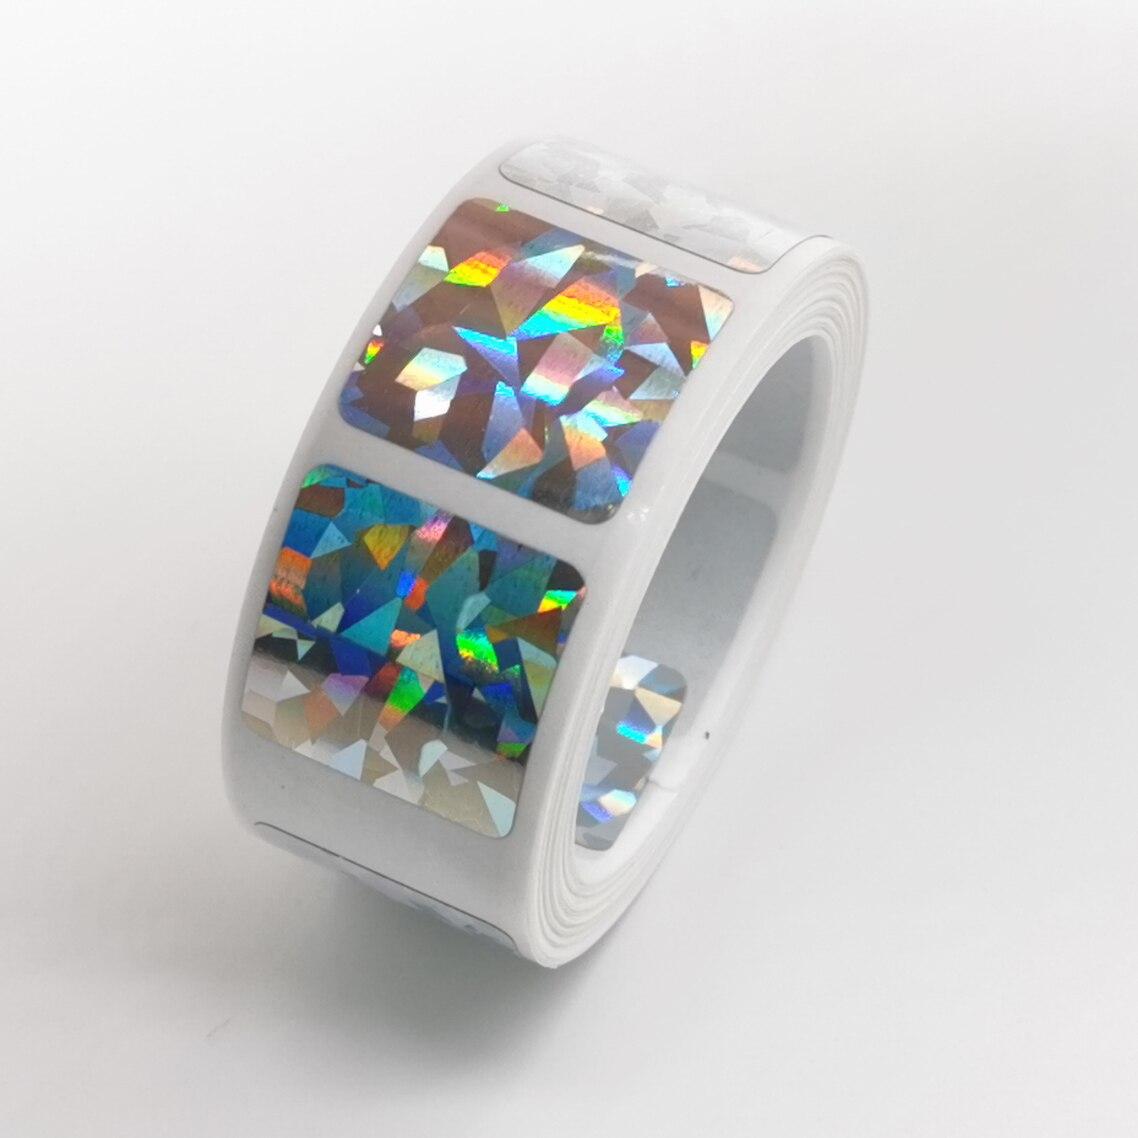 500Pcs Scratch Off Stickers 20*20mm Square Diamond laser Color Metallic Hologram game Scratch Sticker   Wedding card